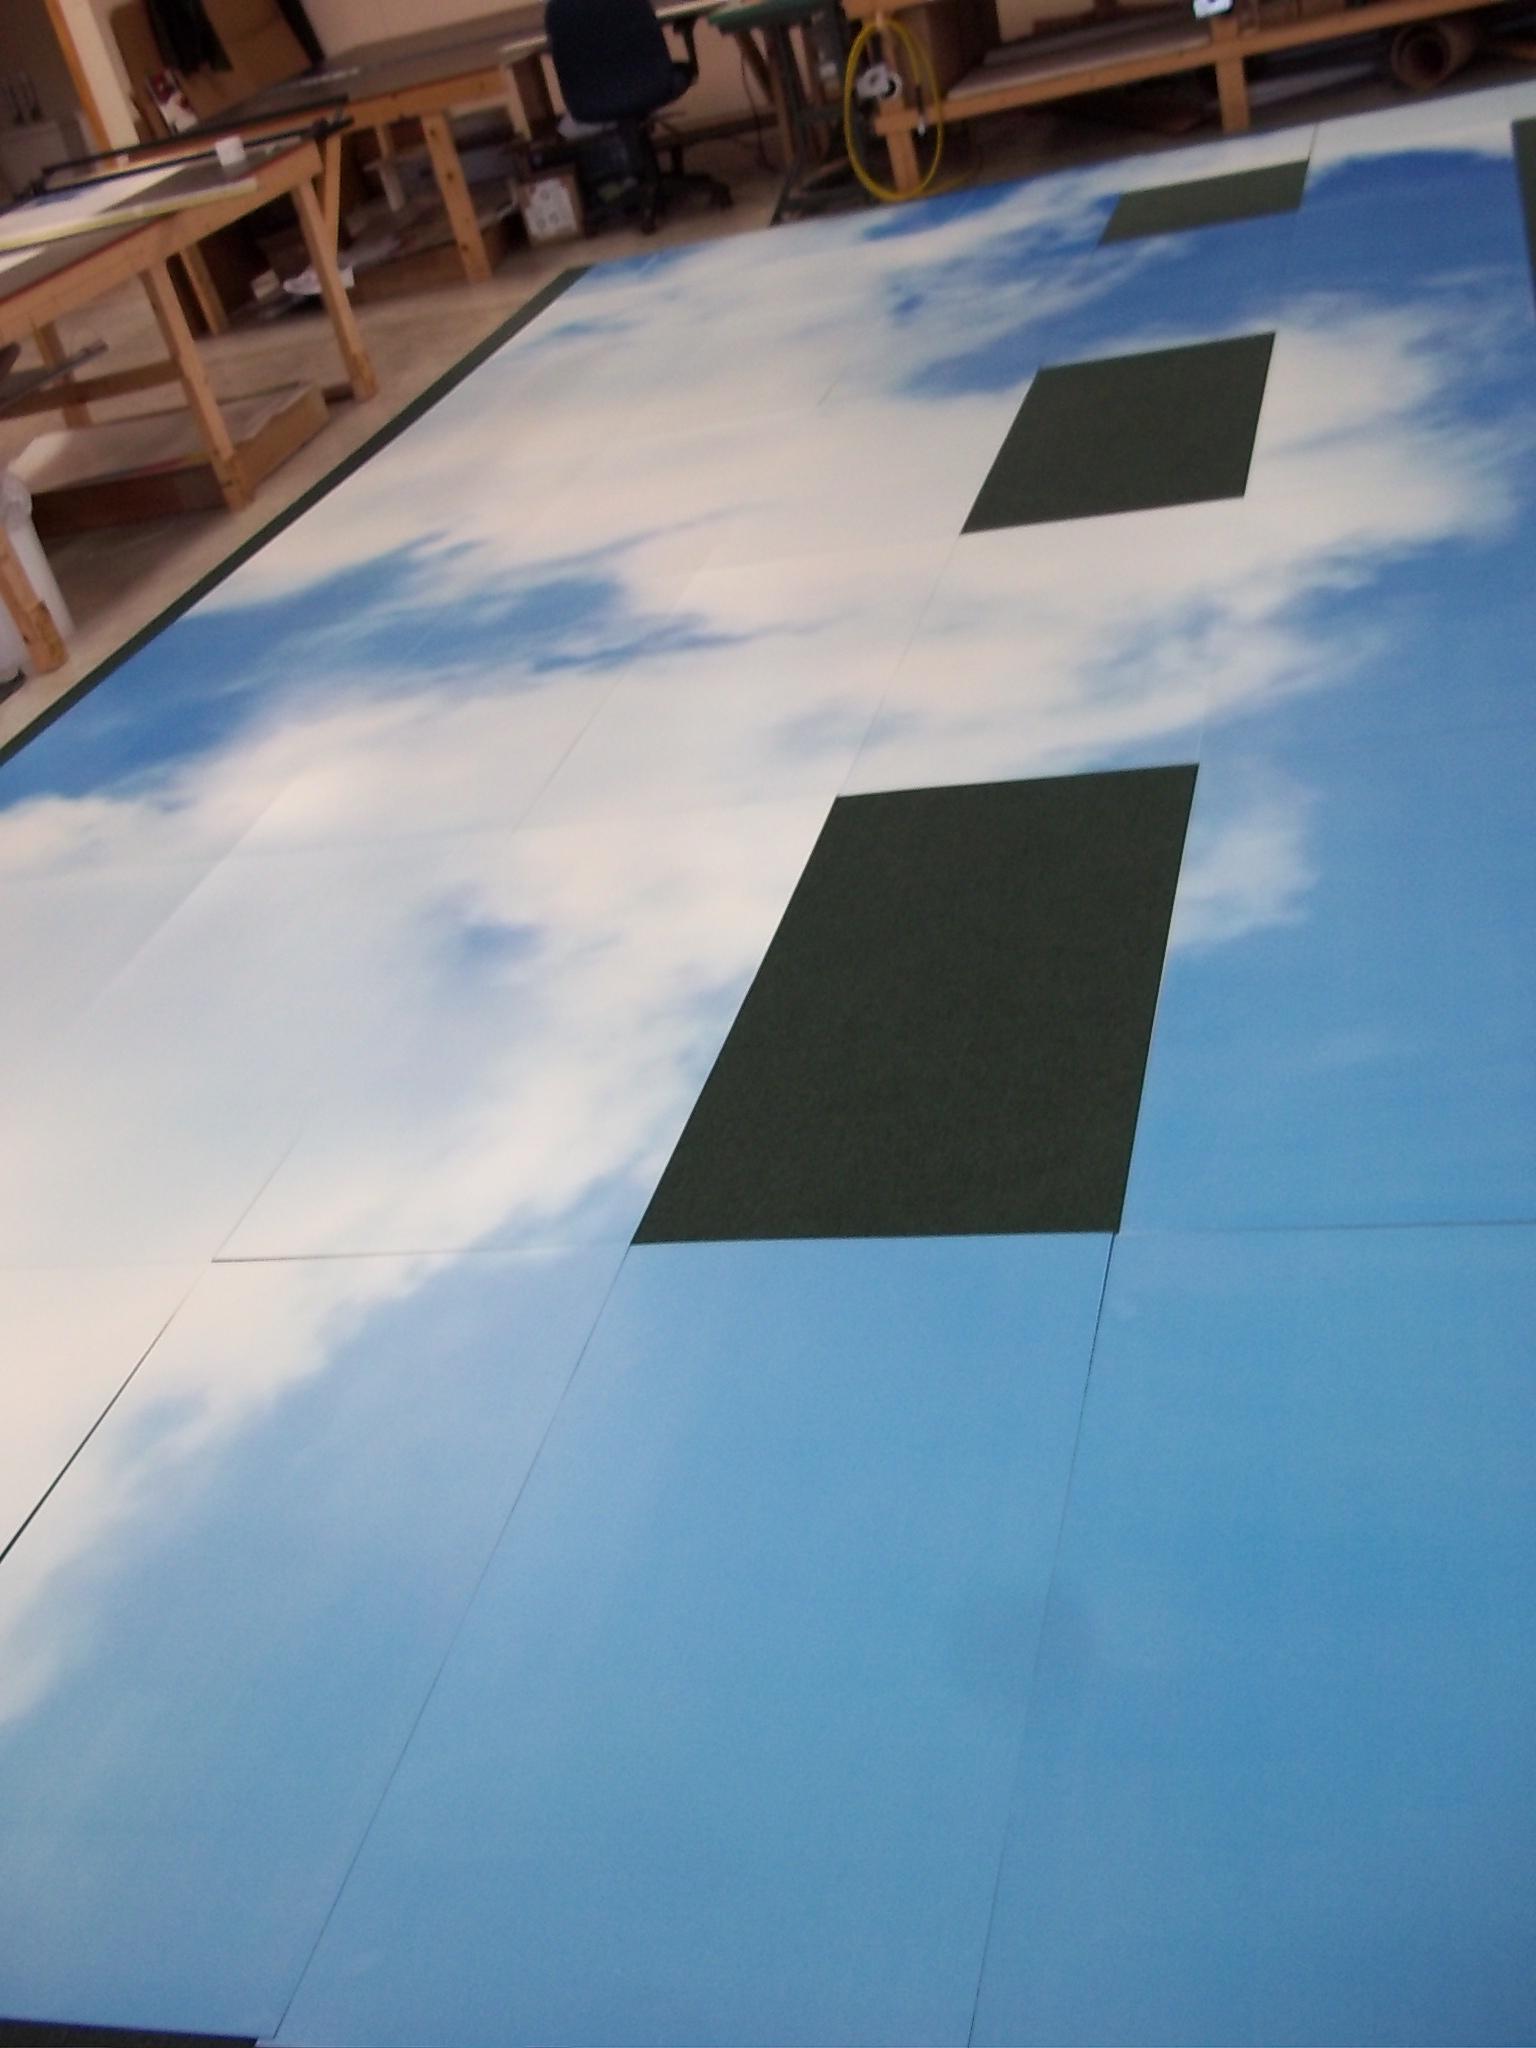 Printed Ceiling Tiles Megaprintinc